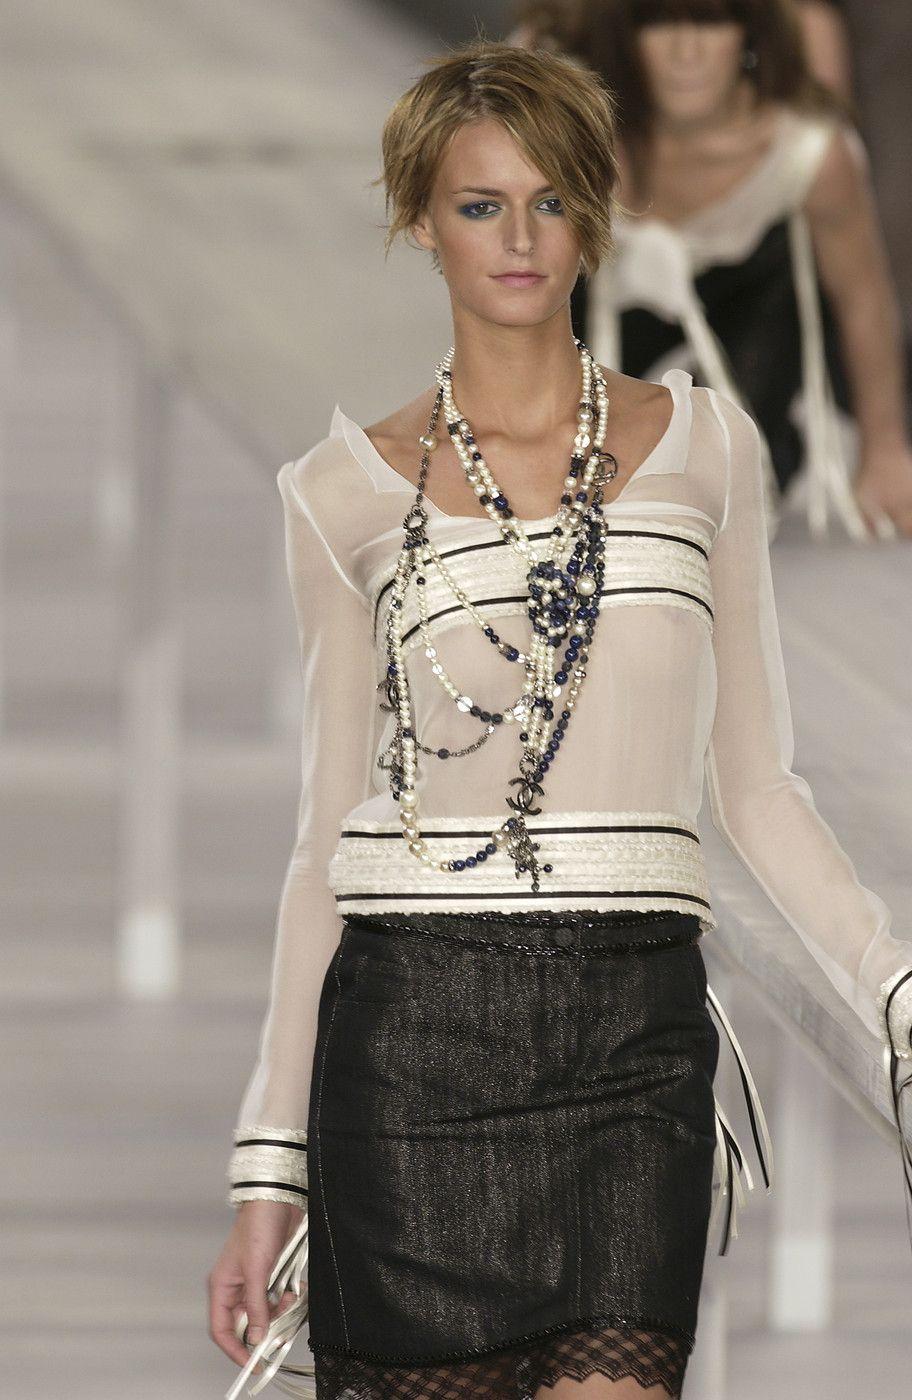 http://www.livingly.com/runway/Chanel/Paris Fashion Week Spring 2004/oxuK2yE8yxN